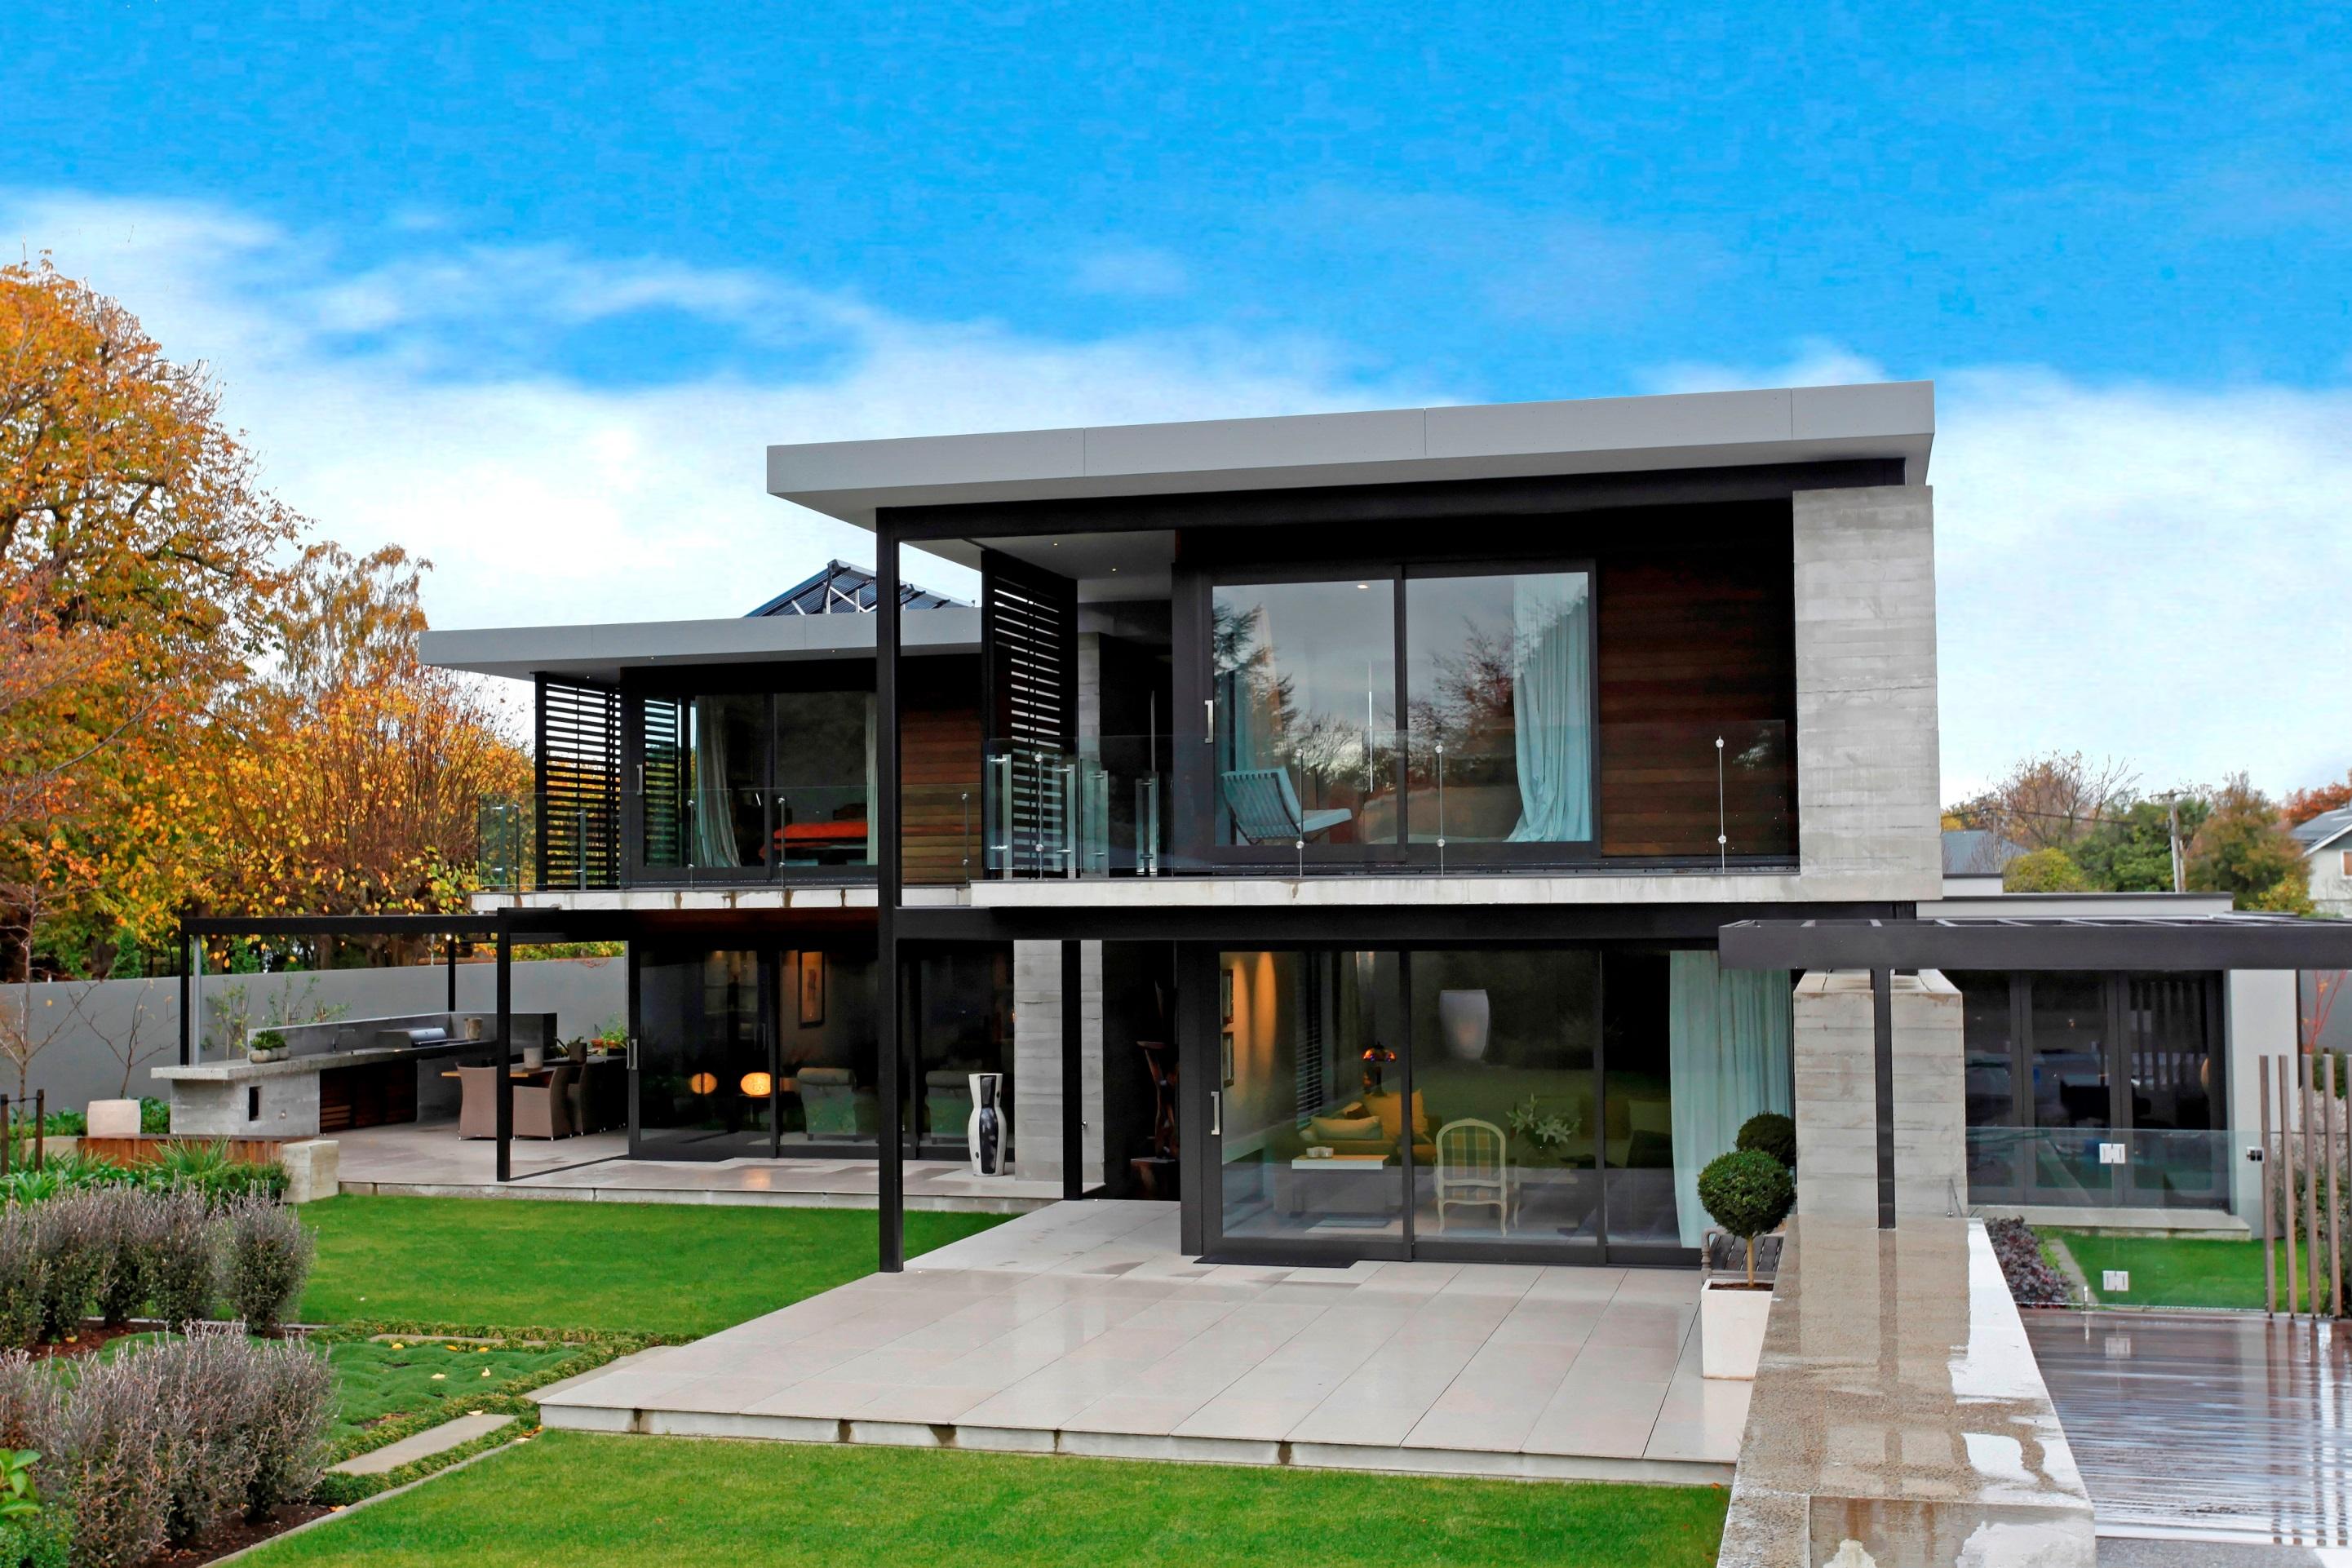 10 sammu oma maja ehituseni